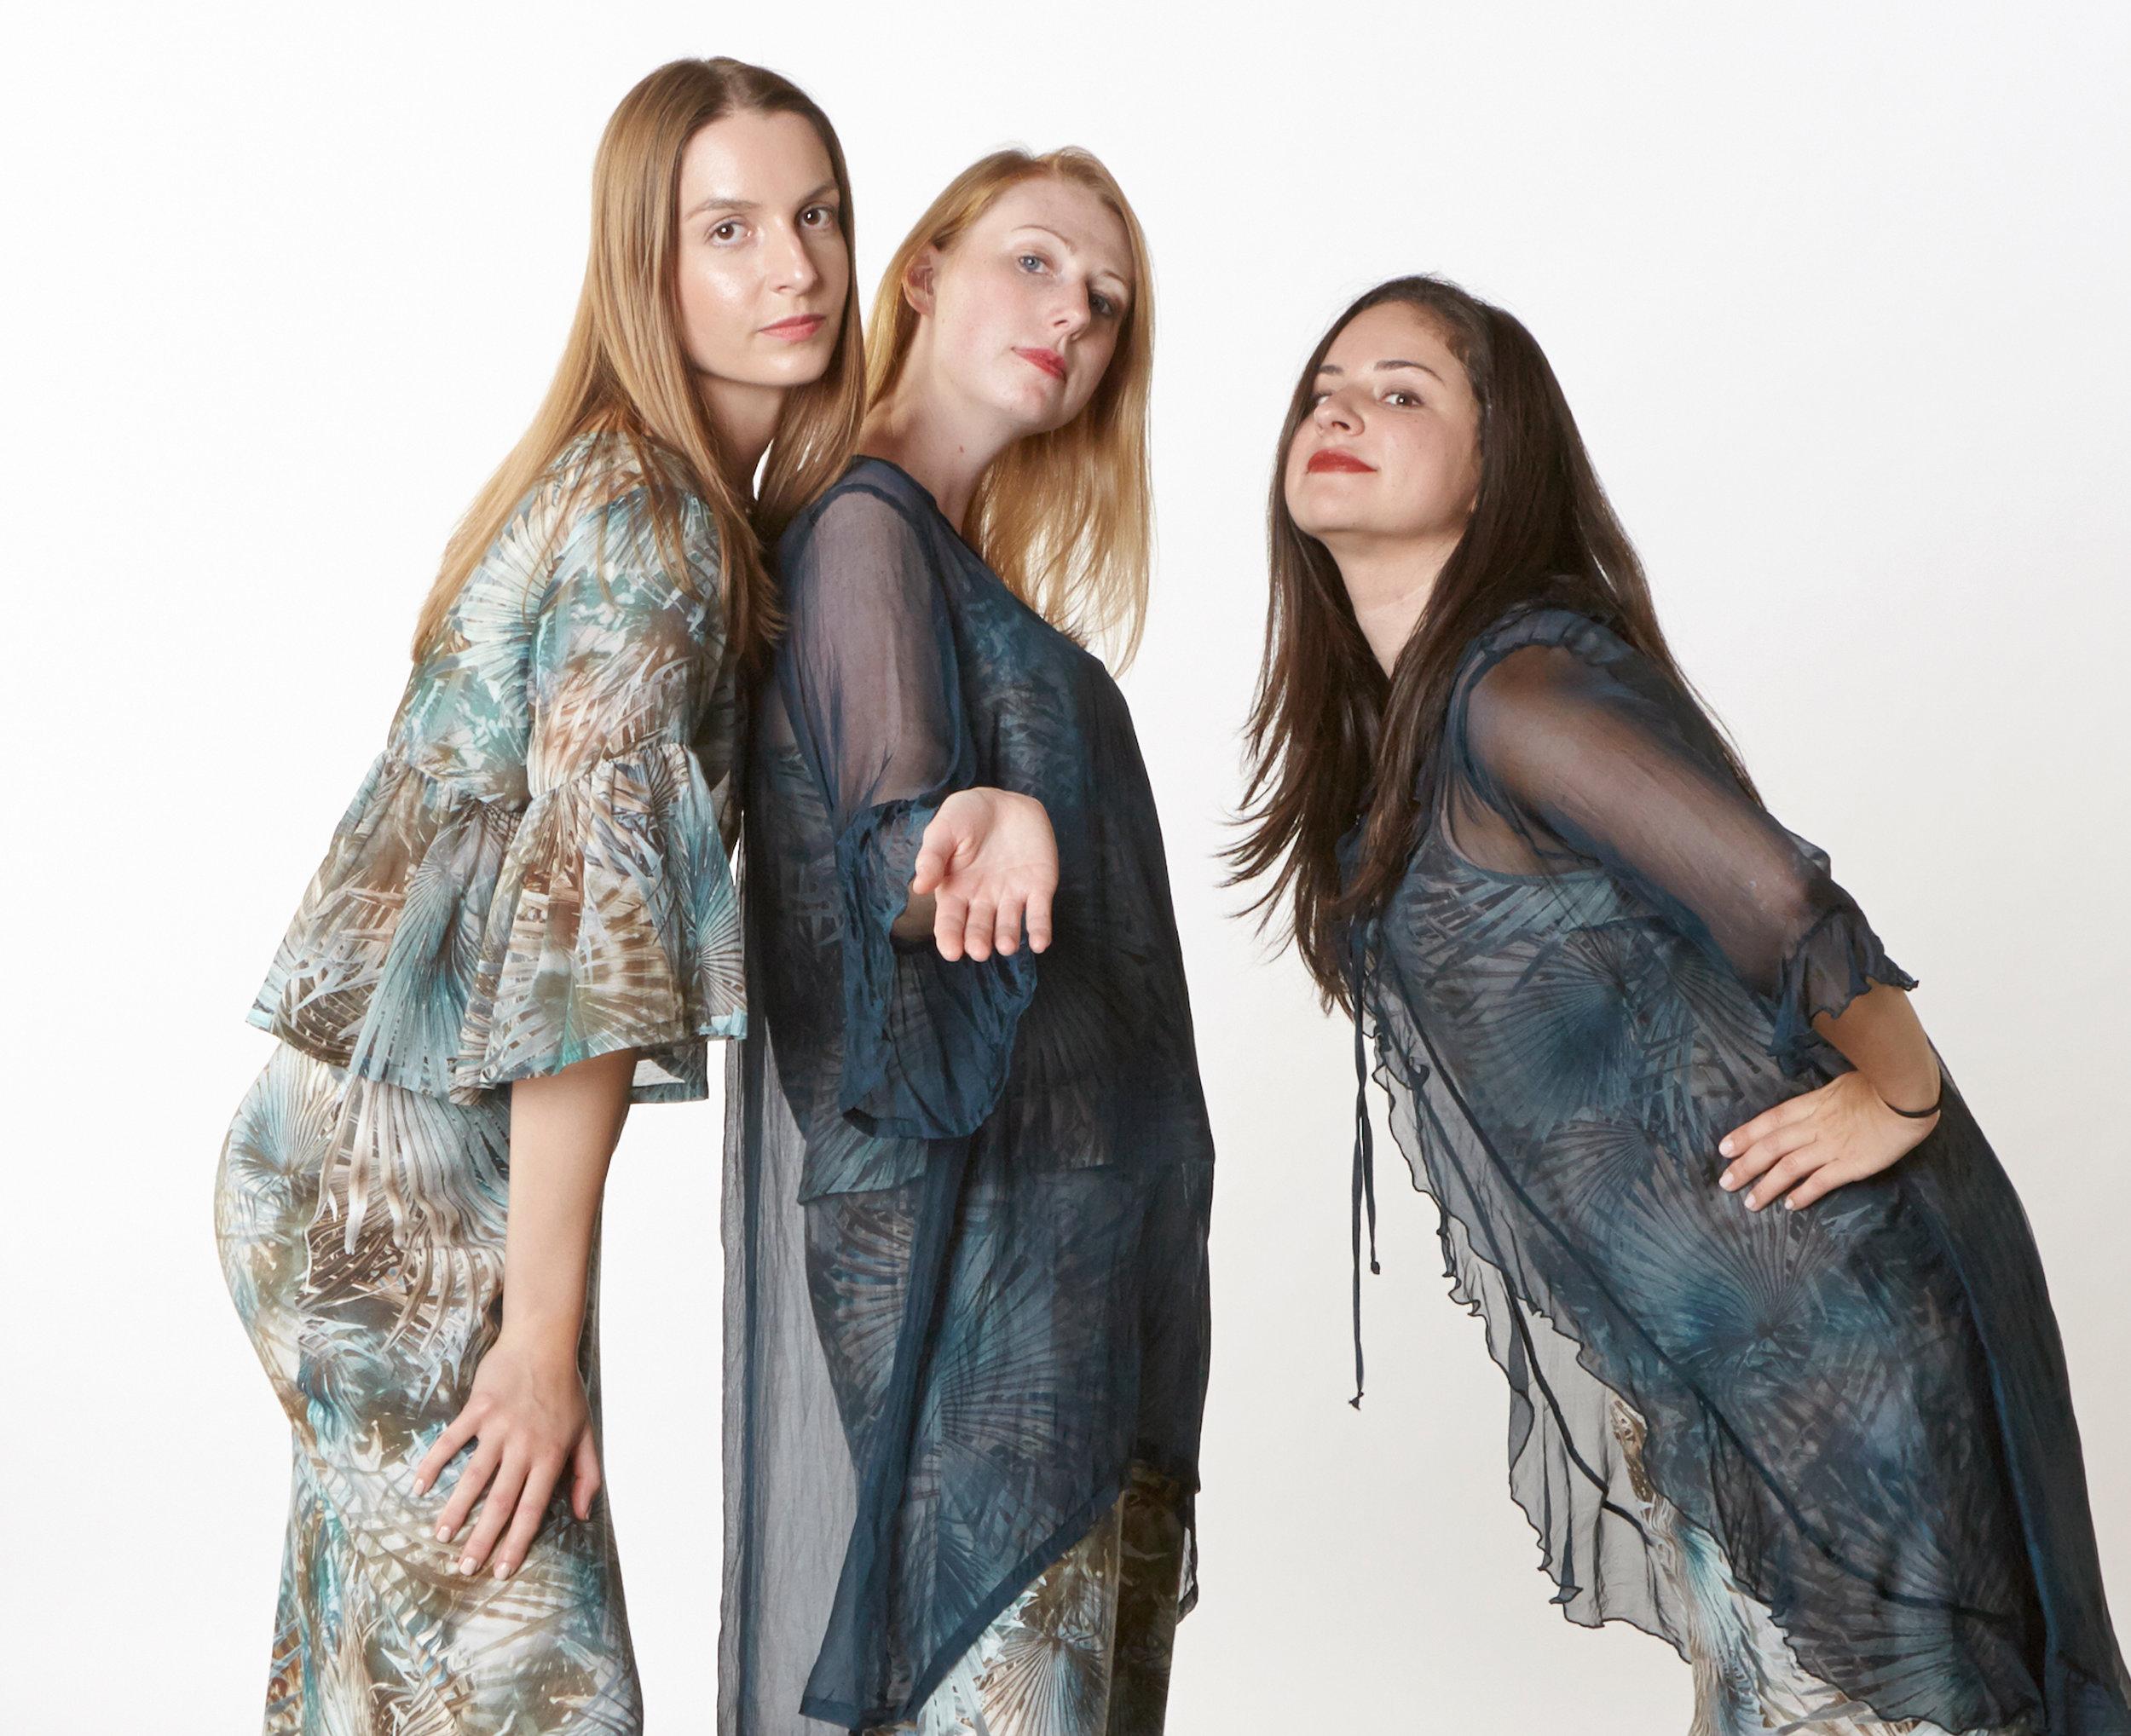 Frida Shirt in Palma Italian Cotton/Silk, Luella Dress, Lucy Tank, Long Bias Skirt in Palma Italian Linen,Phryne Tunic, Camille Cardigan in Teal Italian Sheer Tie Dye Silk